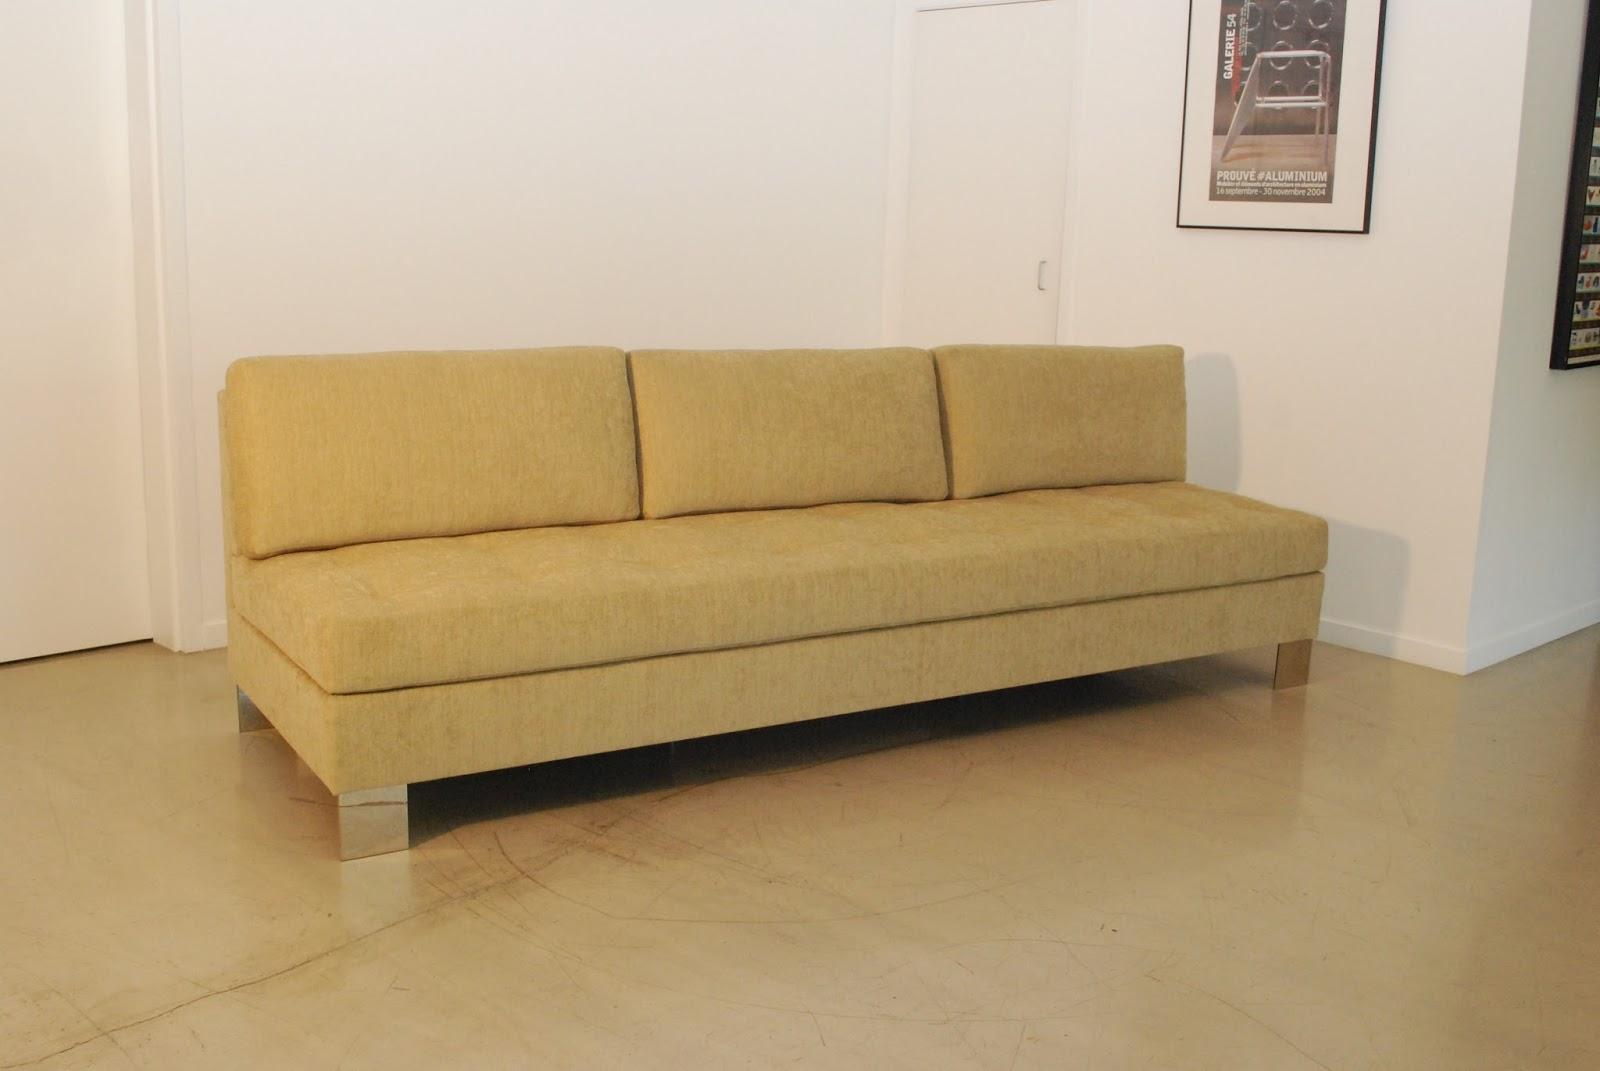 Armless Sofas Design Sofascore Roma Vs Atalanta Classic Custom